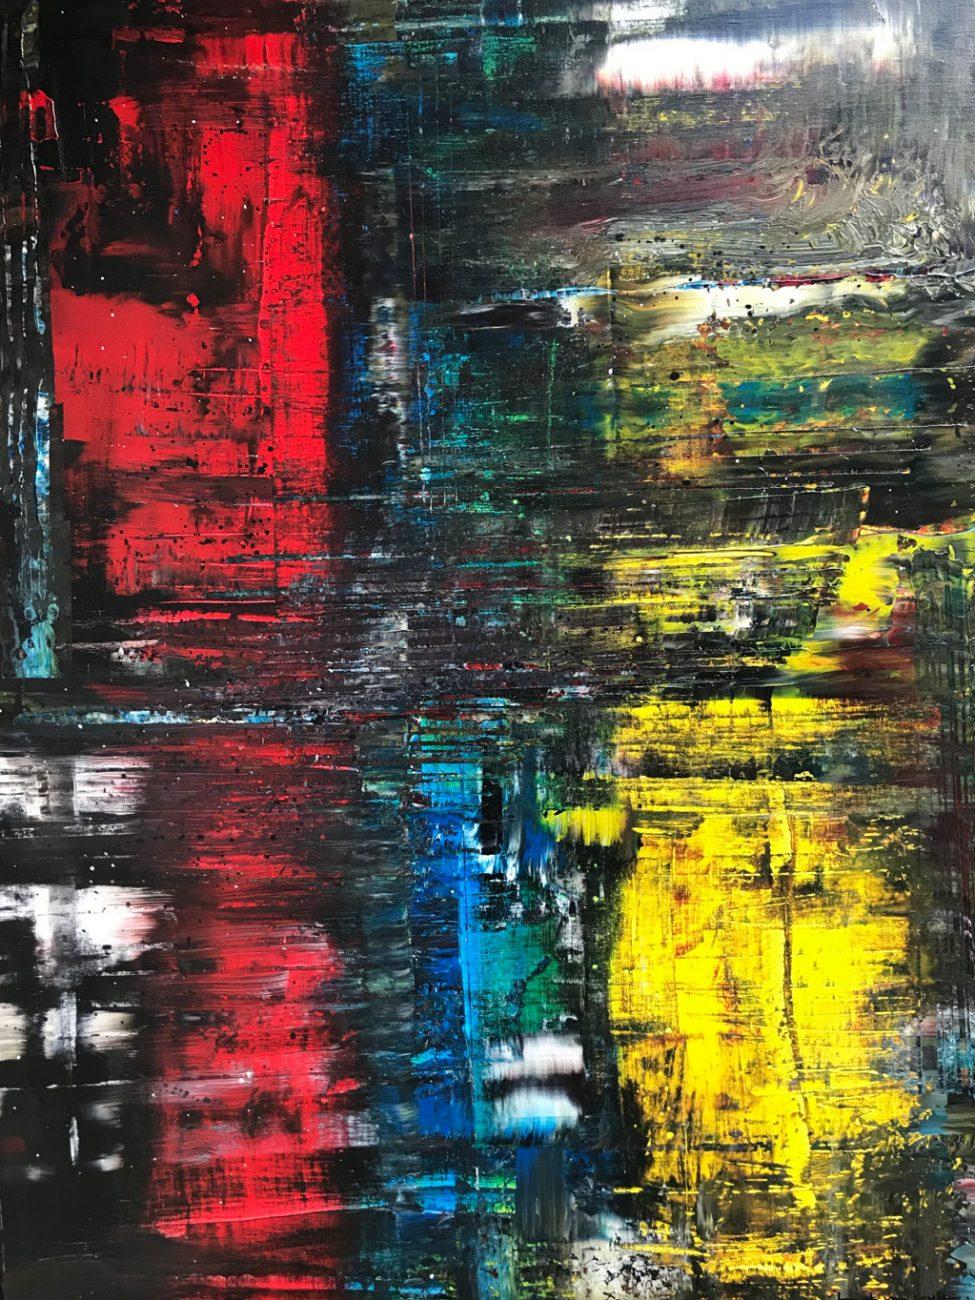 Titel: Red Blue Yellow - 60 x 80 cm Acryl op canvas 950 euro